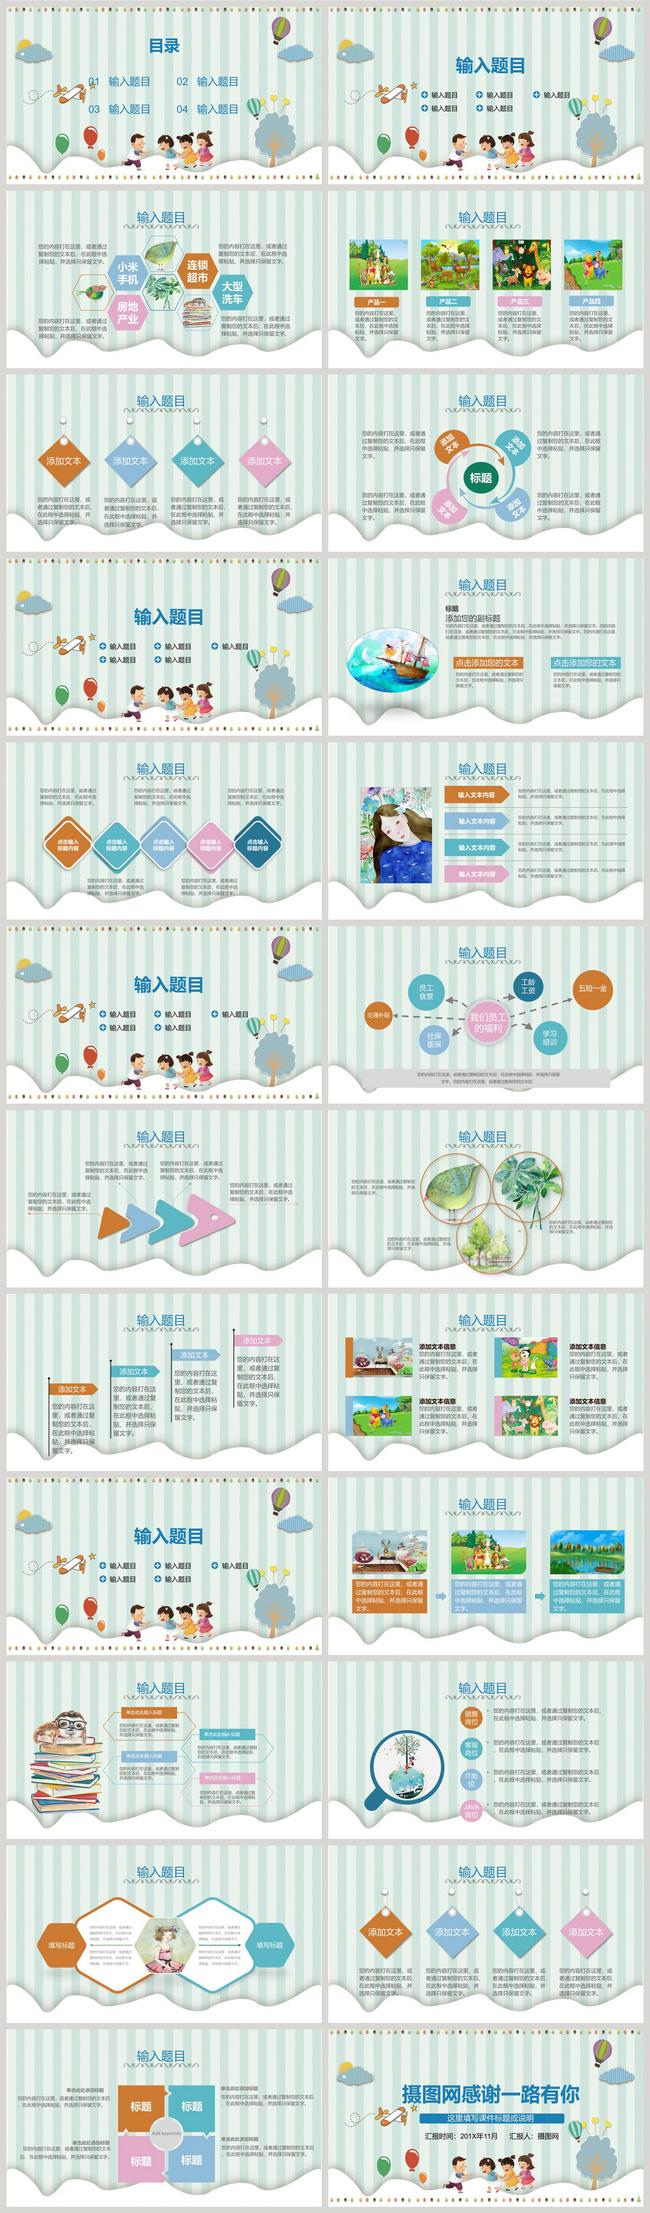 Template Ppt Pendidikan Anak Anak Tk Gambar Unduh Gratis Power Point 400185511 Format Gambar Pptx Lovepik Com